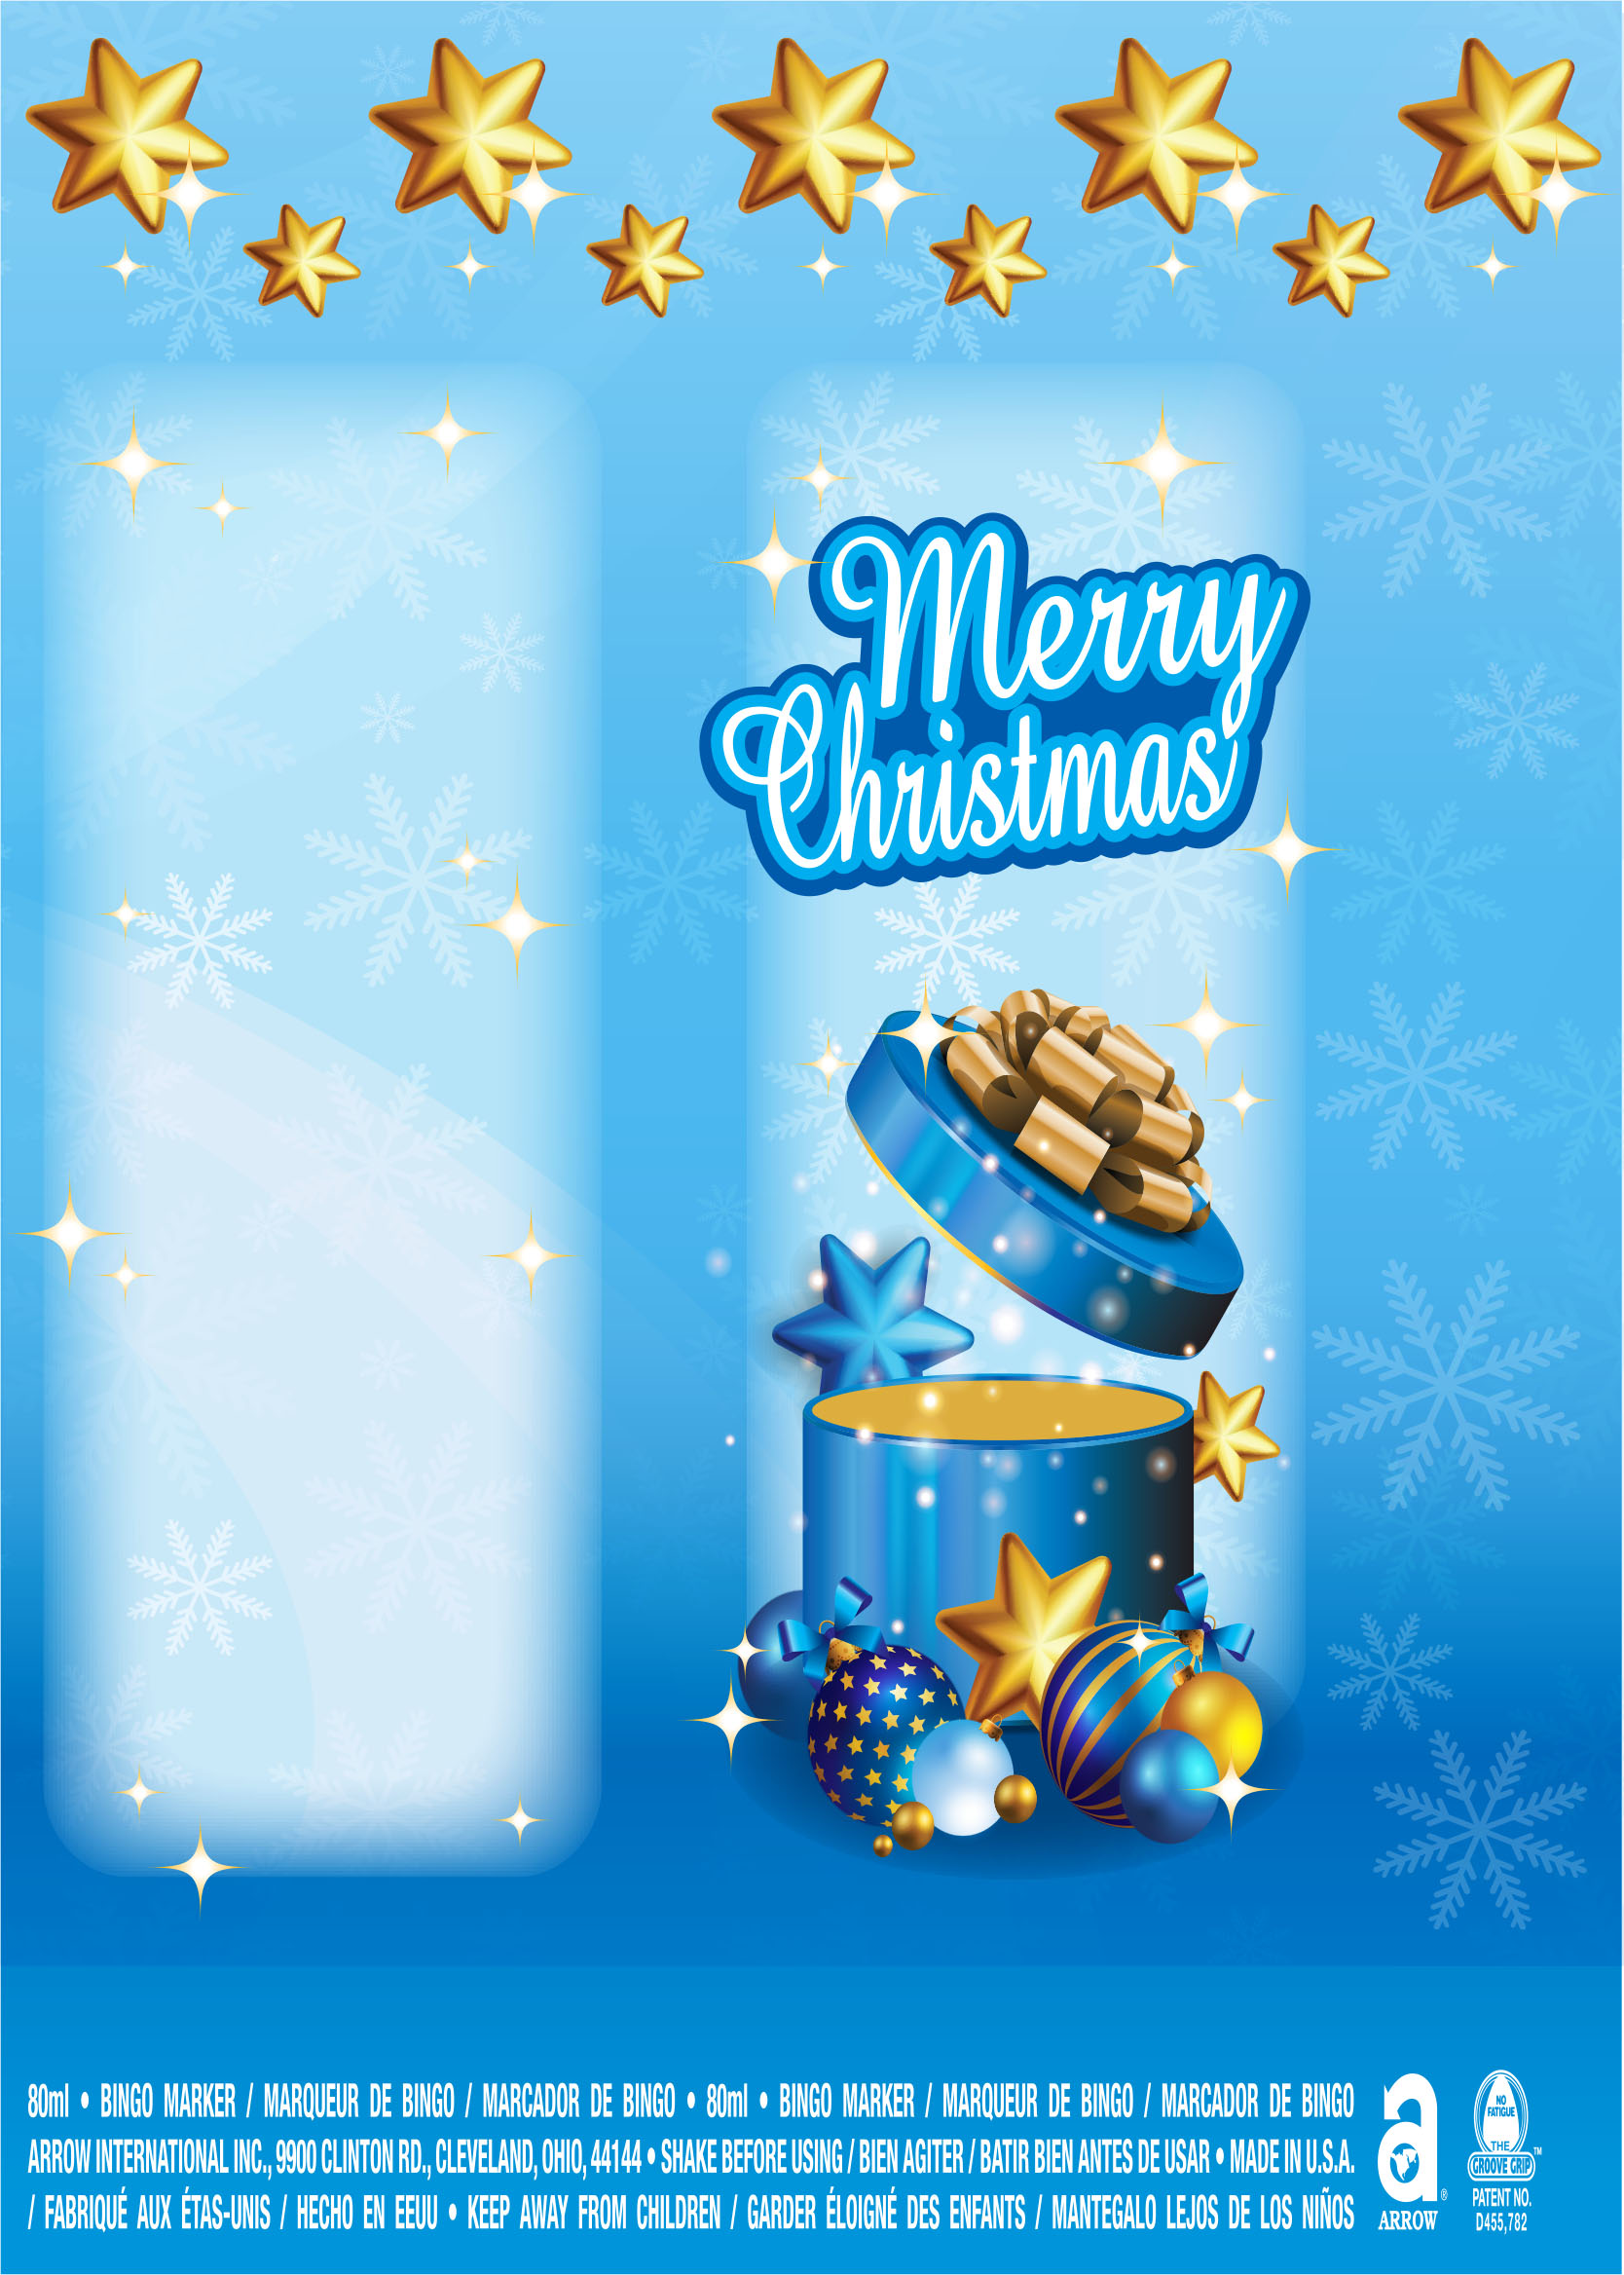 Merry Christmas / Gift and Stars